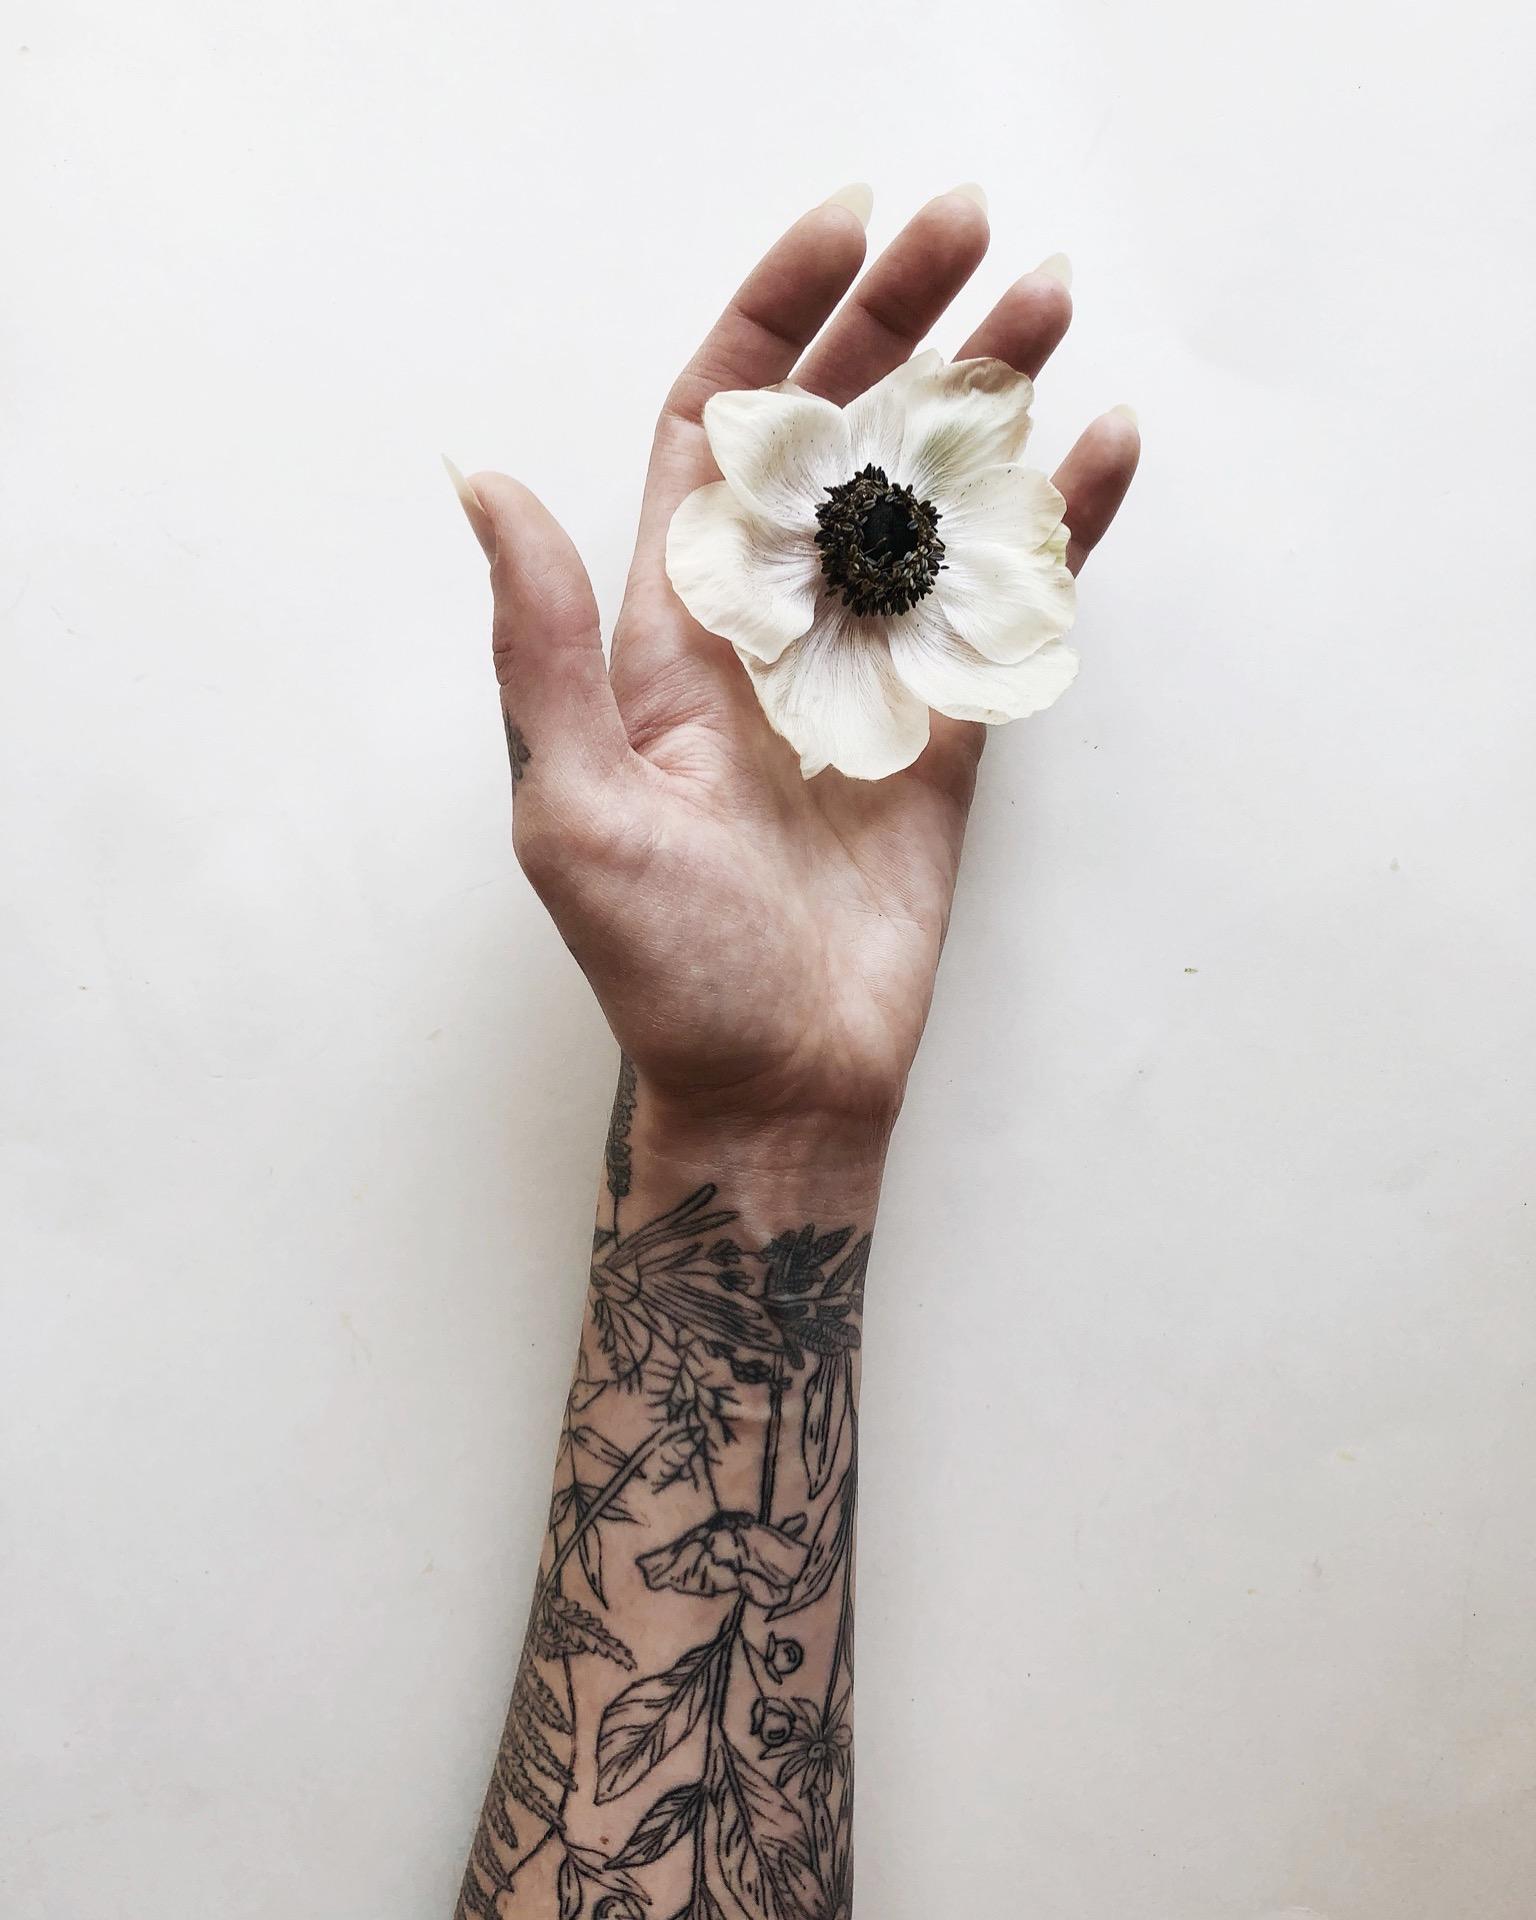 fern + floret botanical minneapolis floral design sharayah krautkremer ray roselia krautkremer